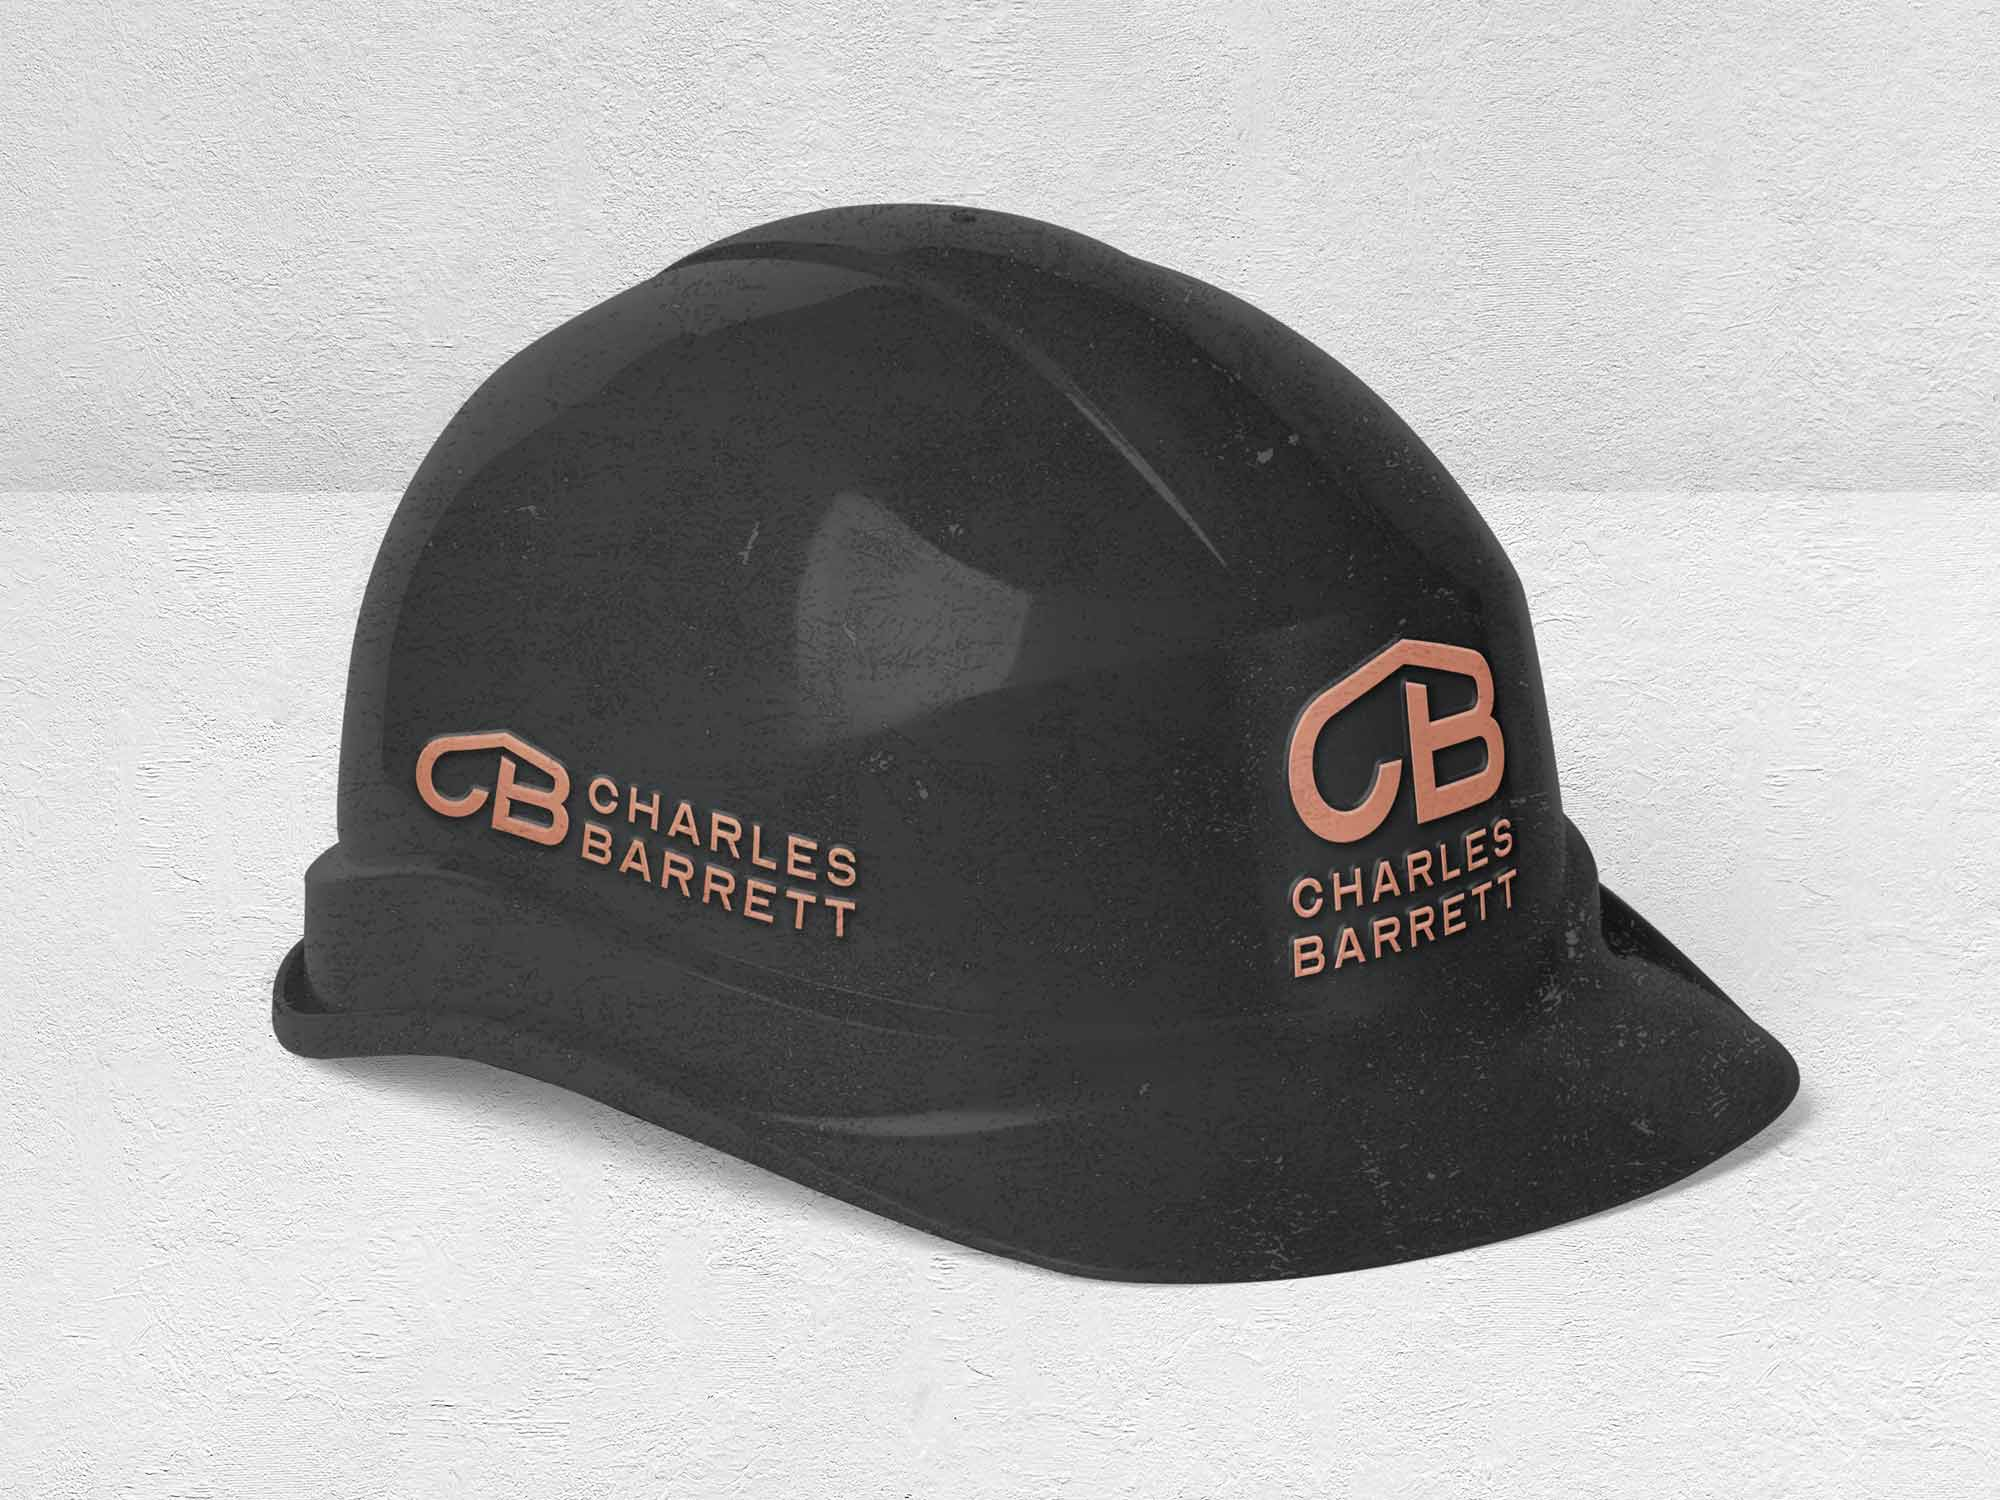 Construction company branding - Helmet with logo